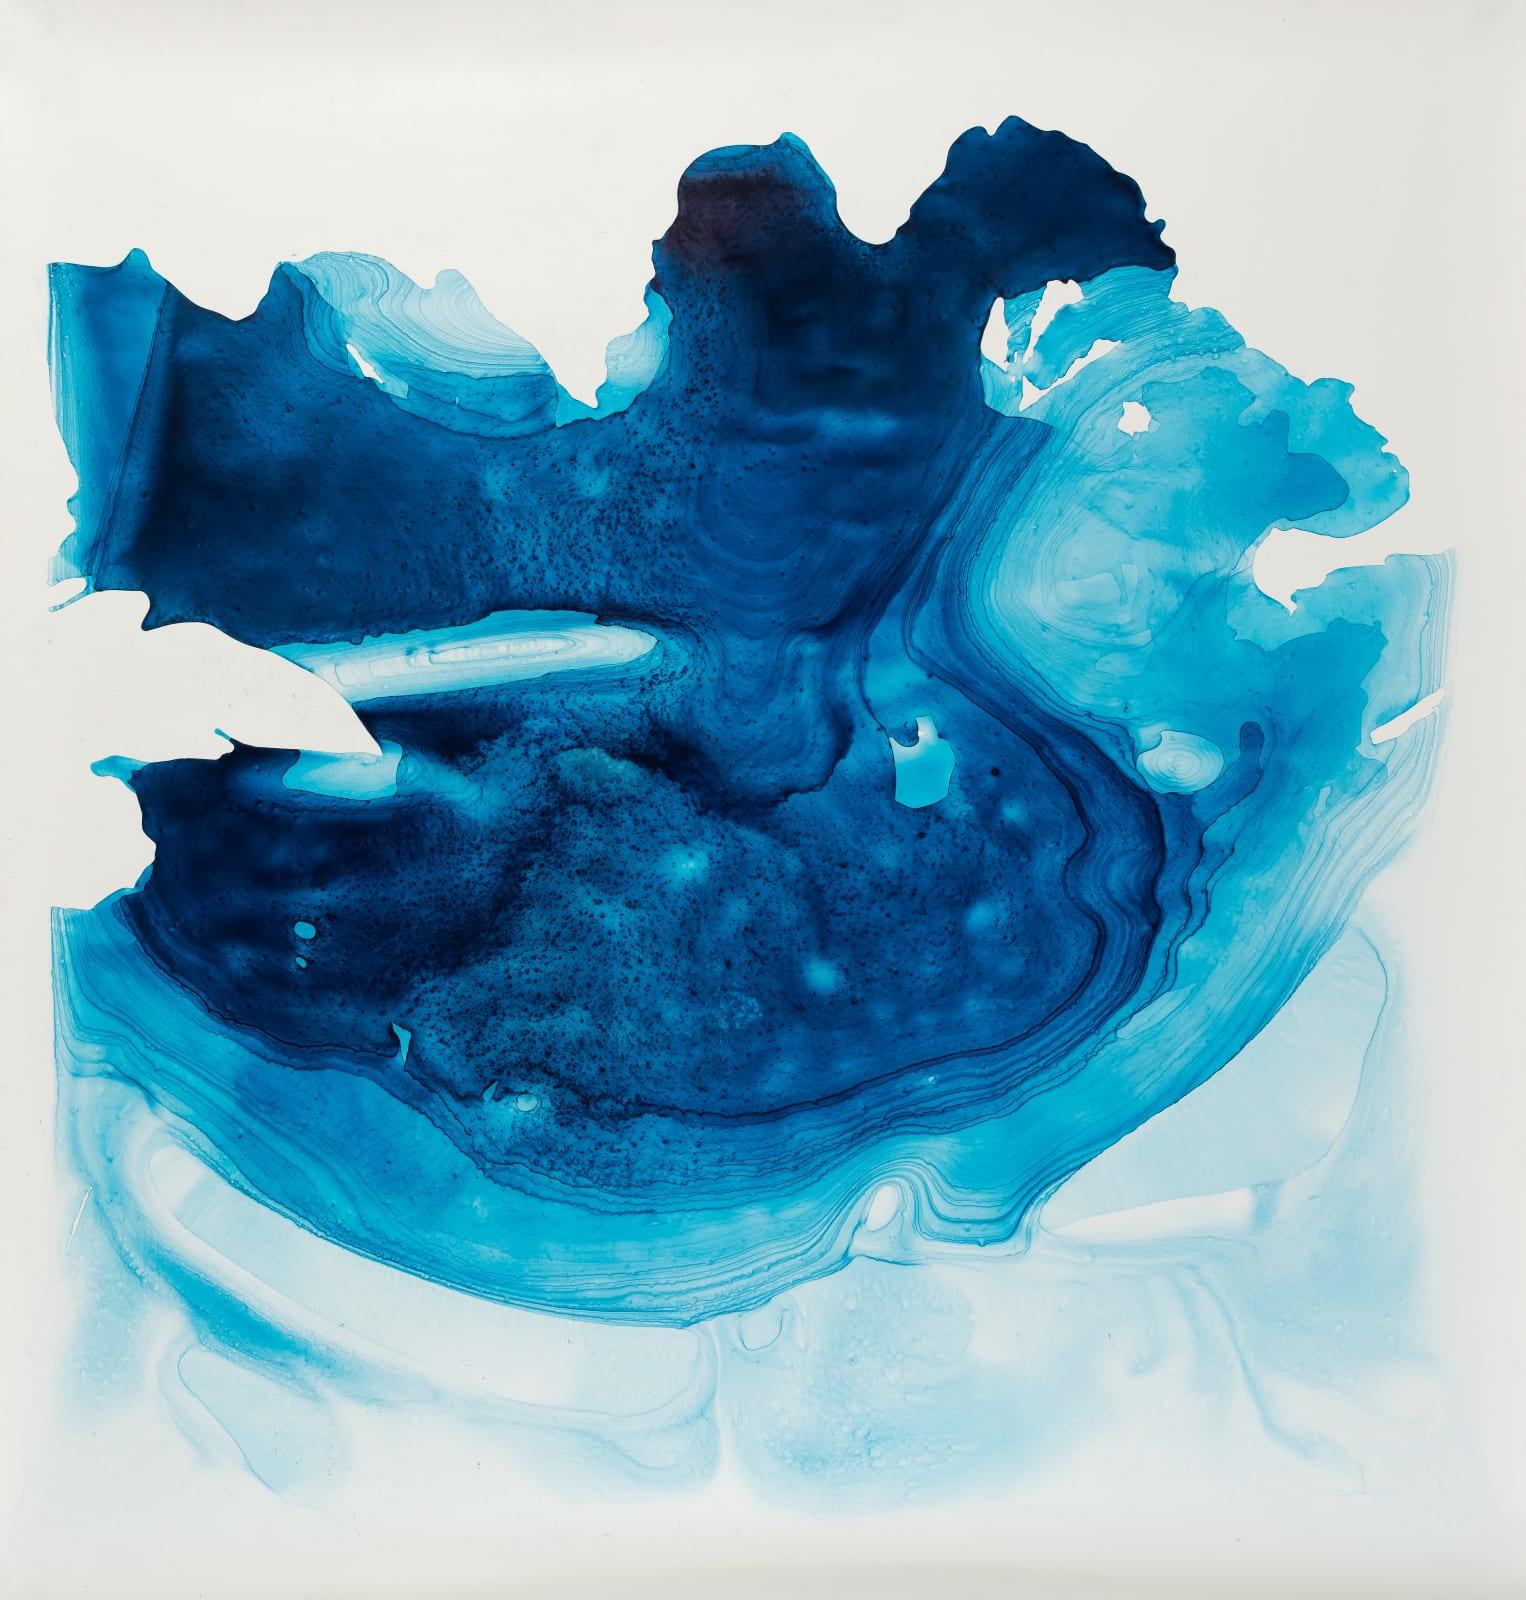 Aditi Singh, Ballad of Blue, 2020